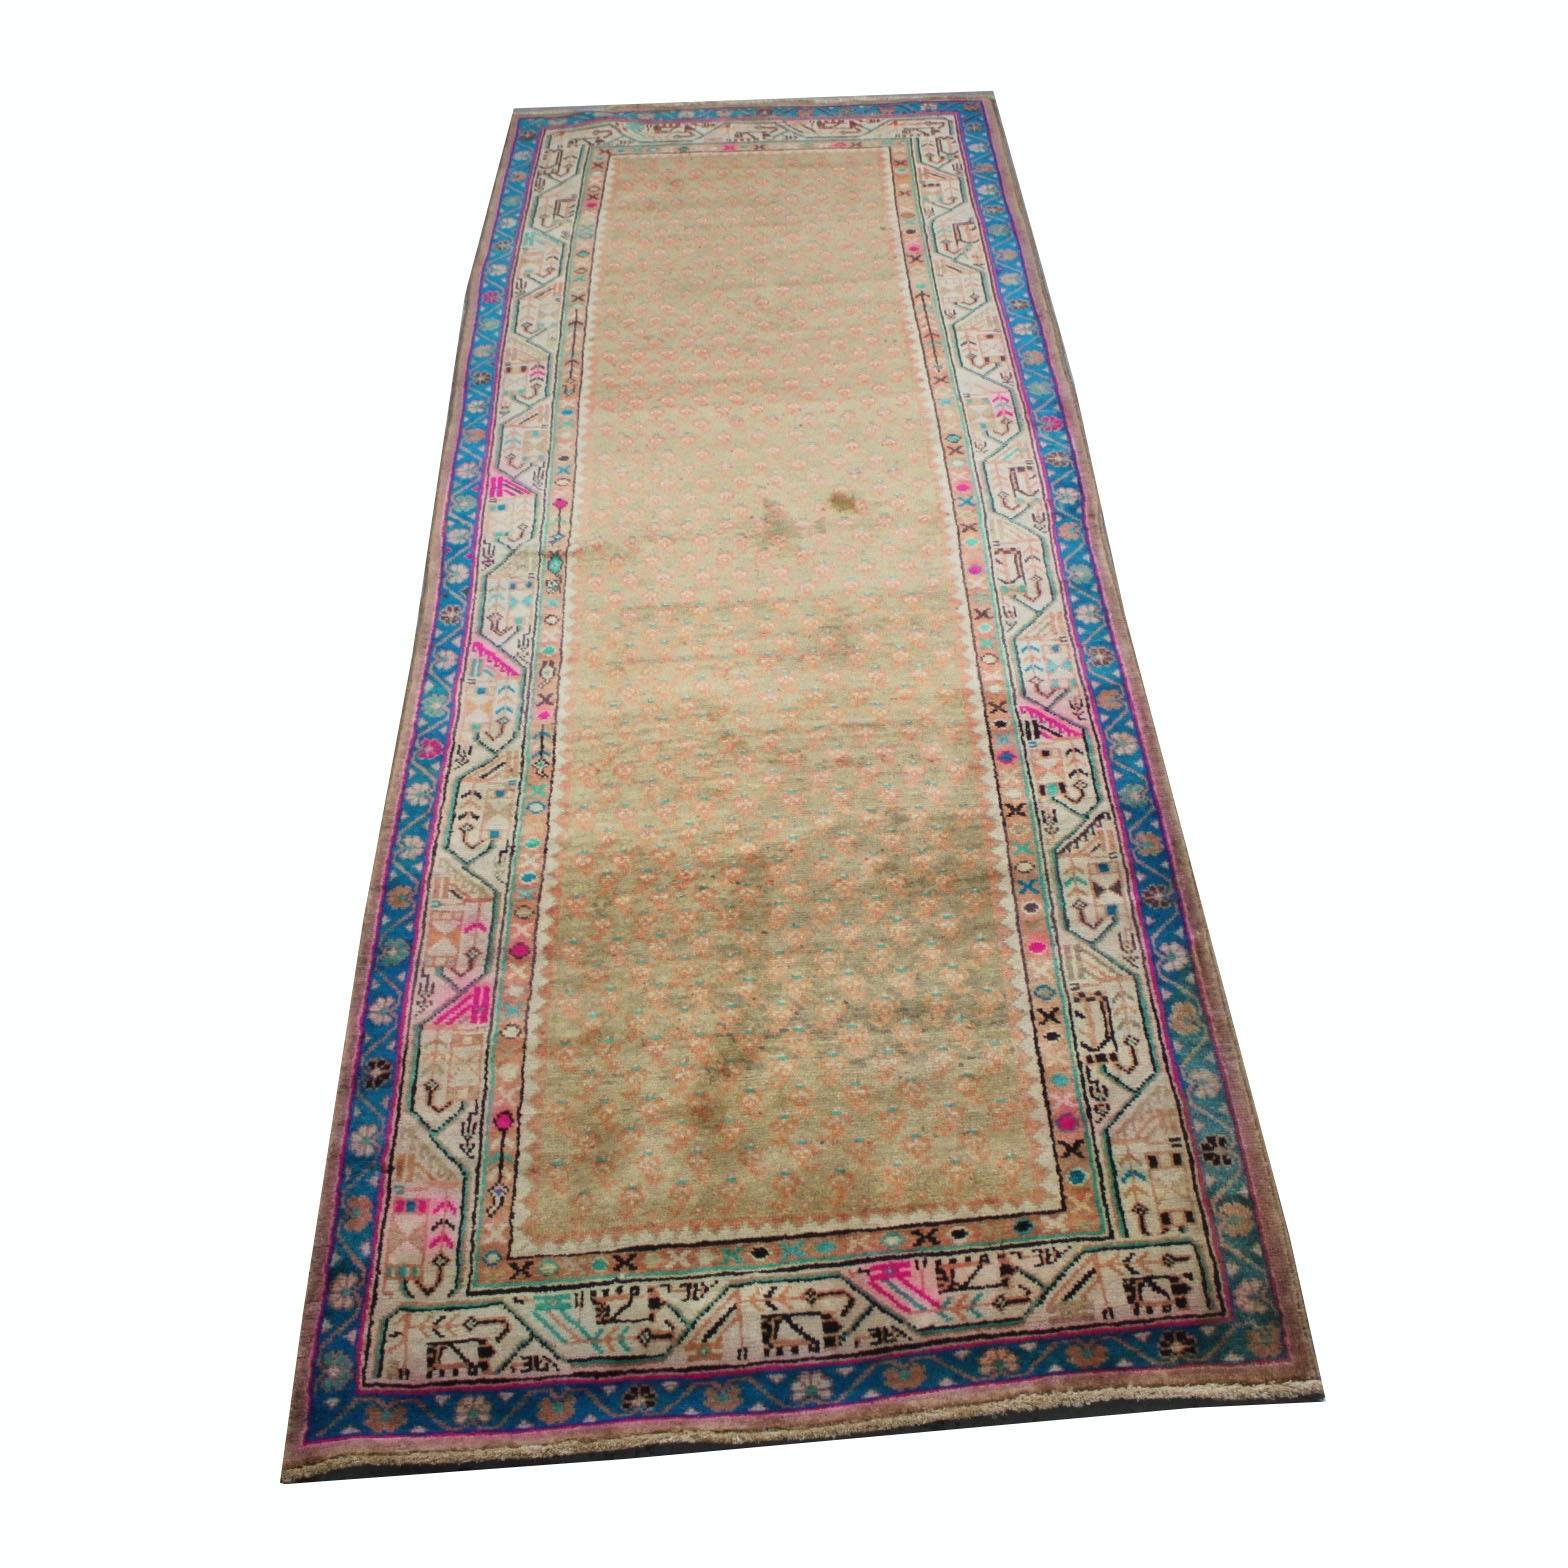 Hand-Knotted Persian Serabend Mir-a-Boteh Carpet Runner